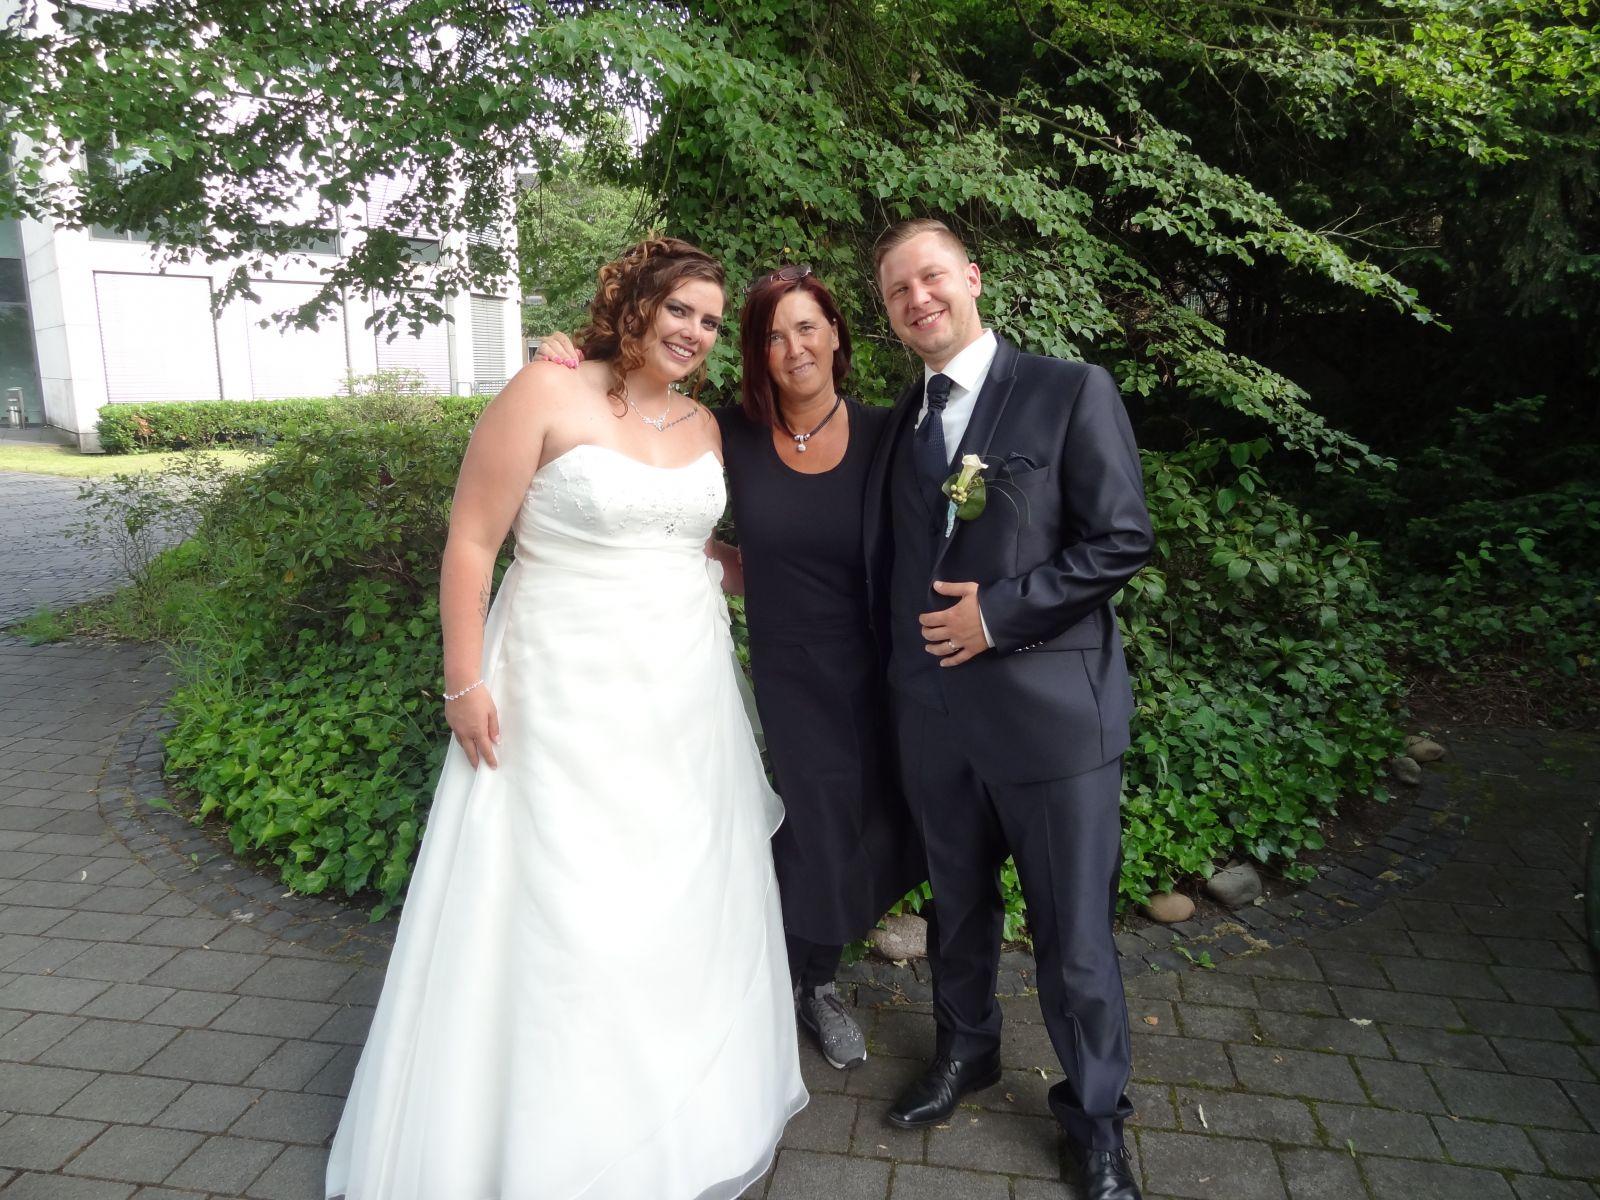 Johanna Diehl 02062017  Brautstudio Anke Tworuschka